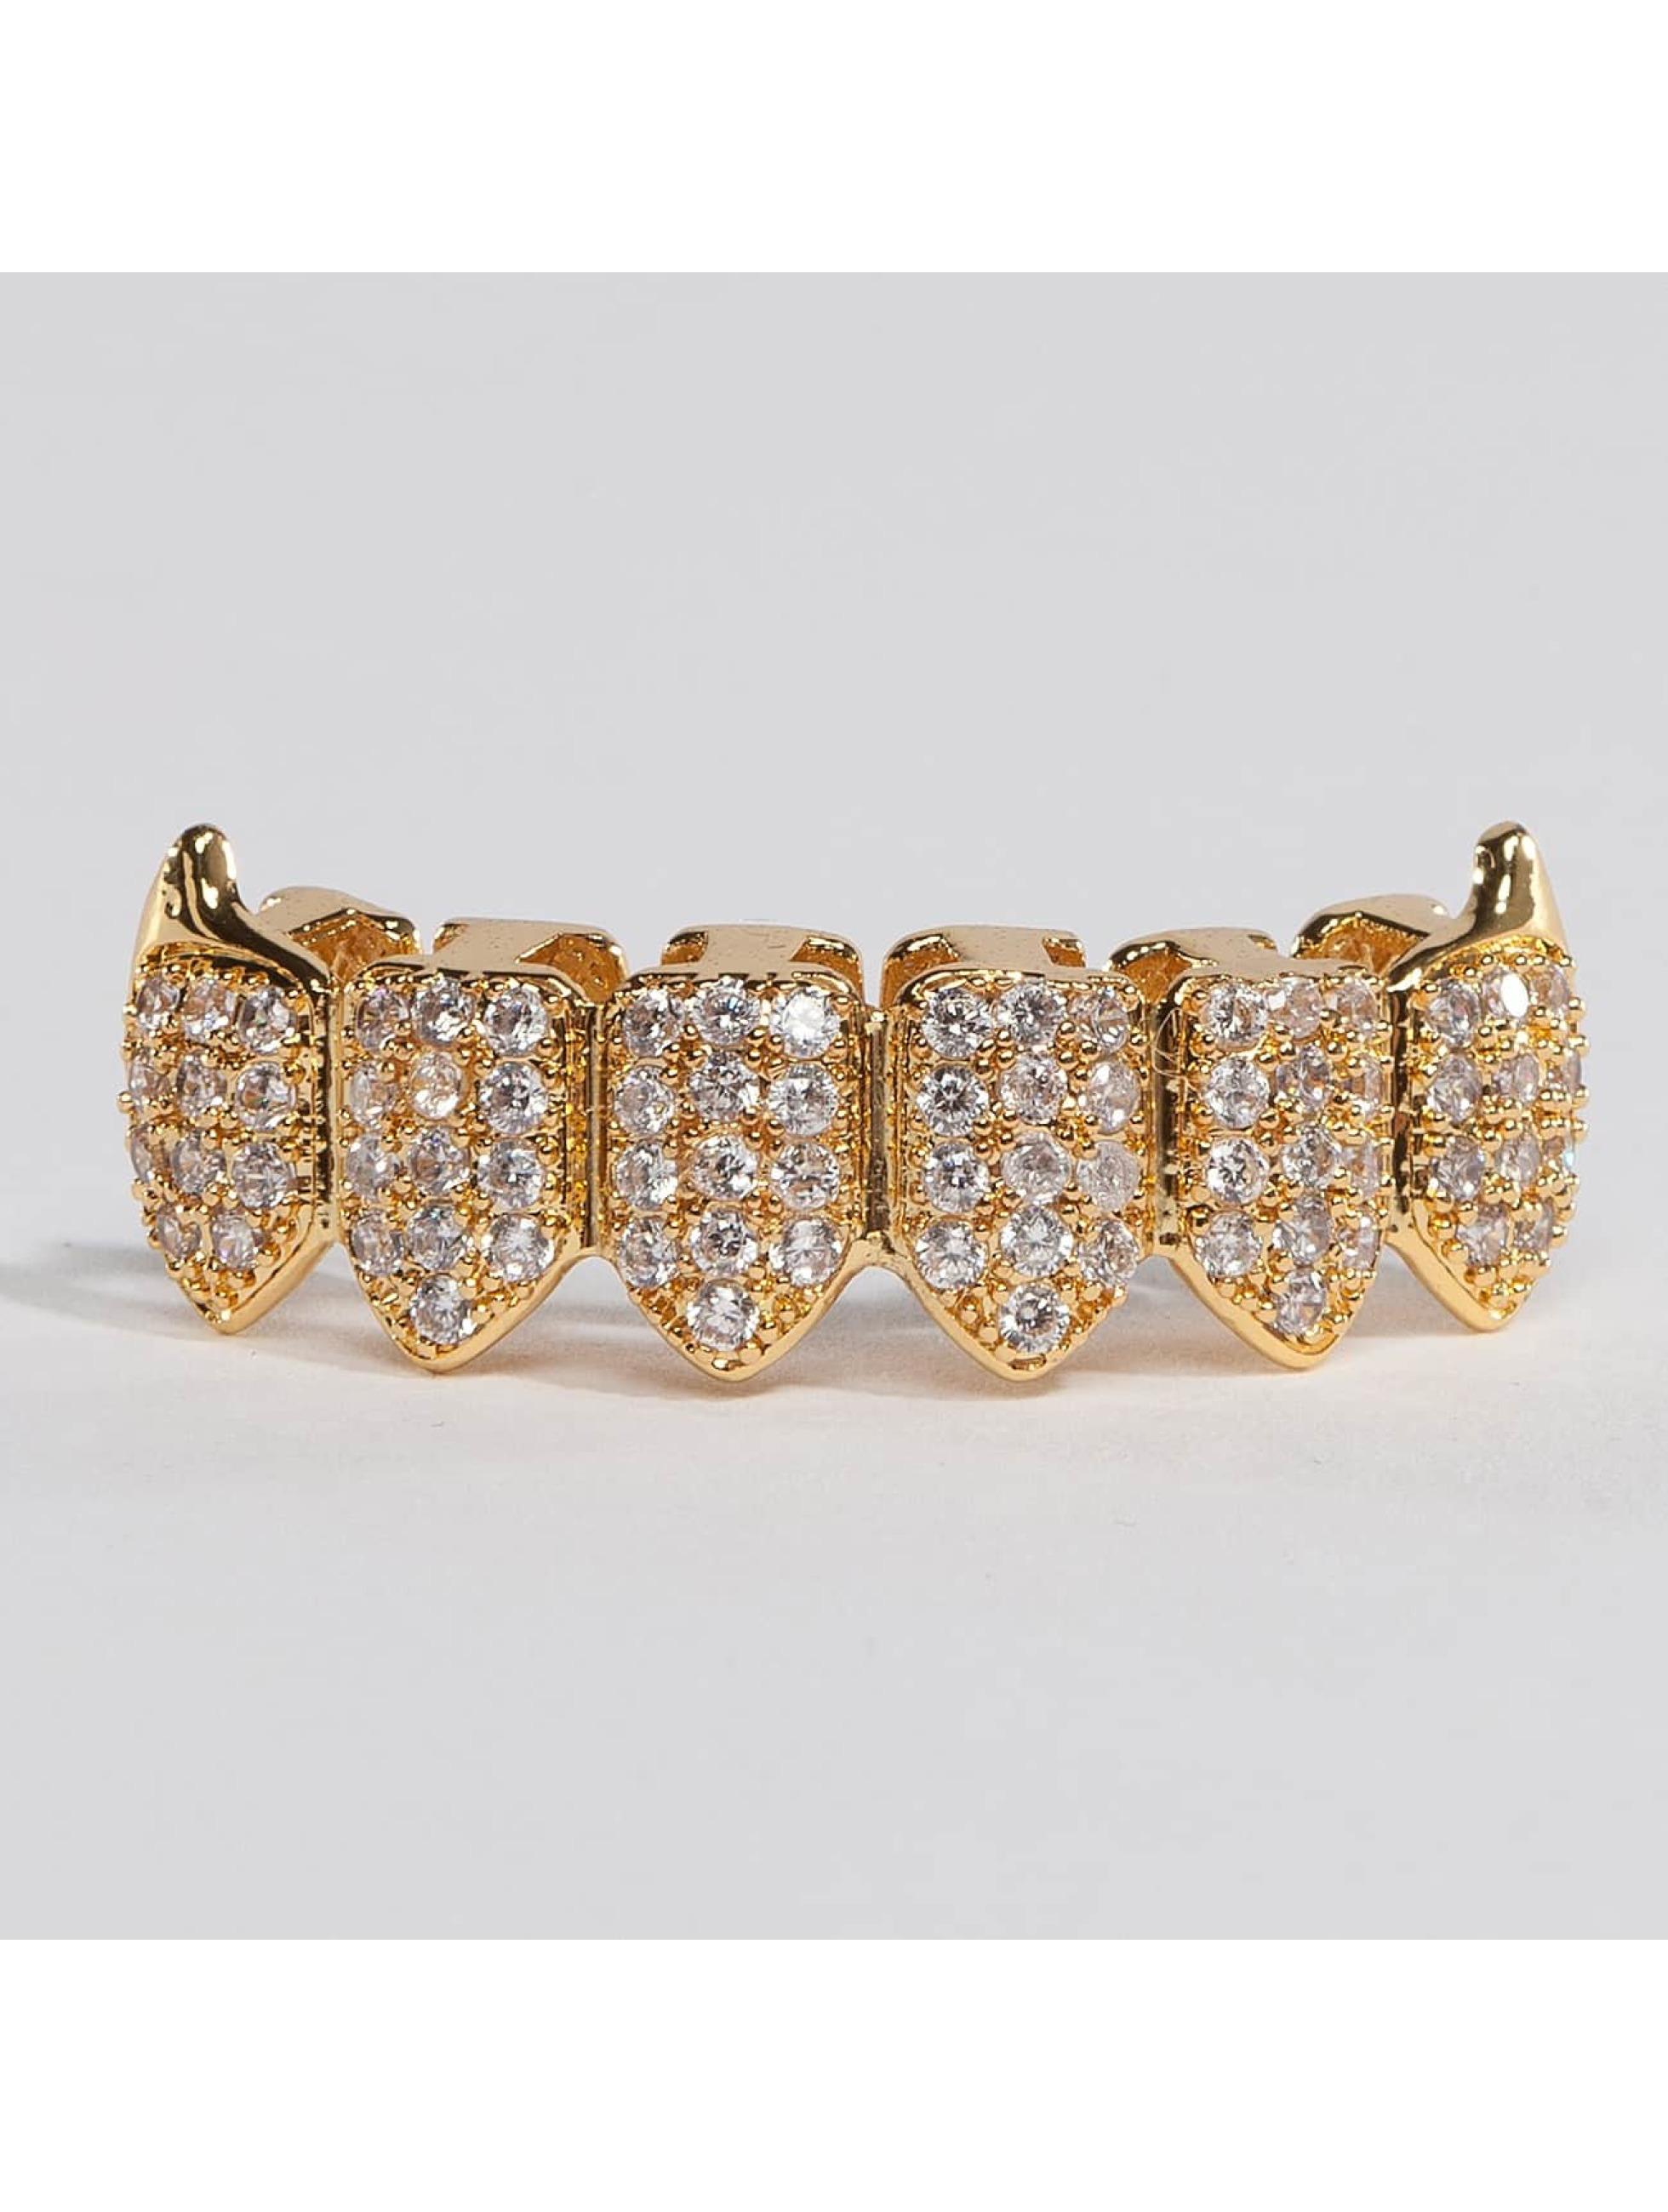 KING ICE Otro Gold_Plated CZ Dracula Teeth Bottom oro